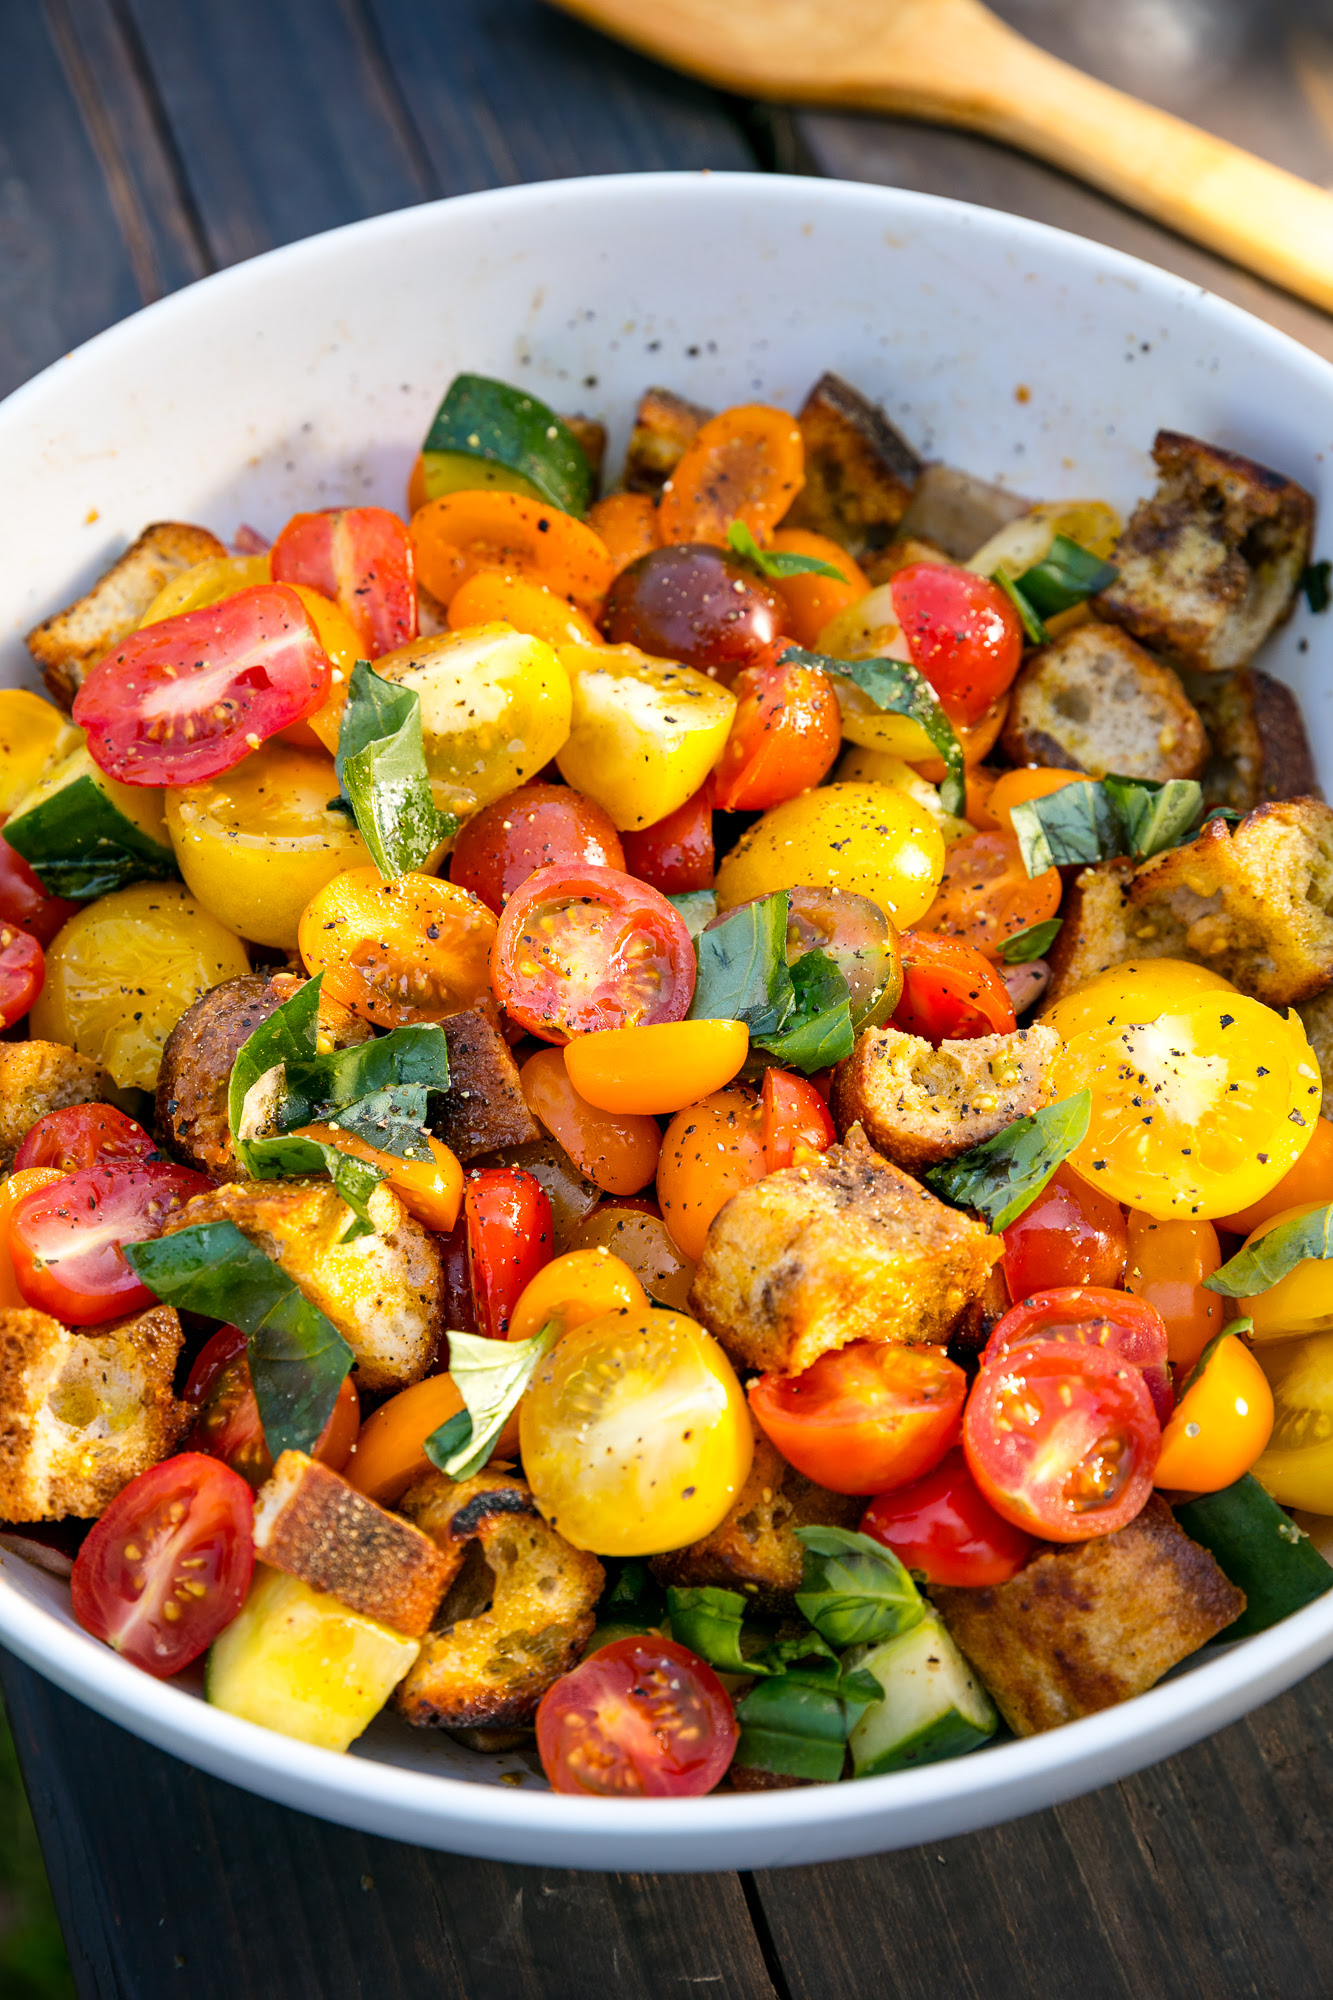 12 Best Tomato Salad Recipes - Easy Ideas for Tomato ...